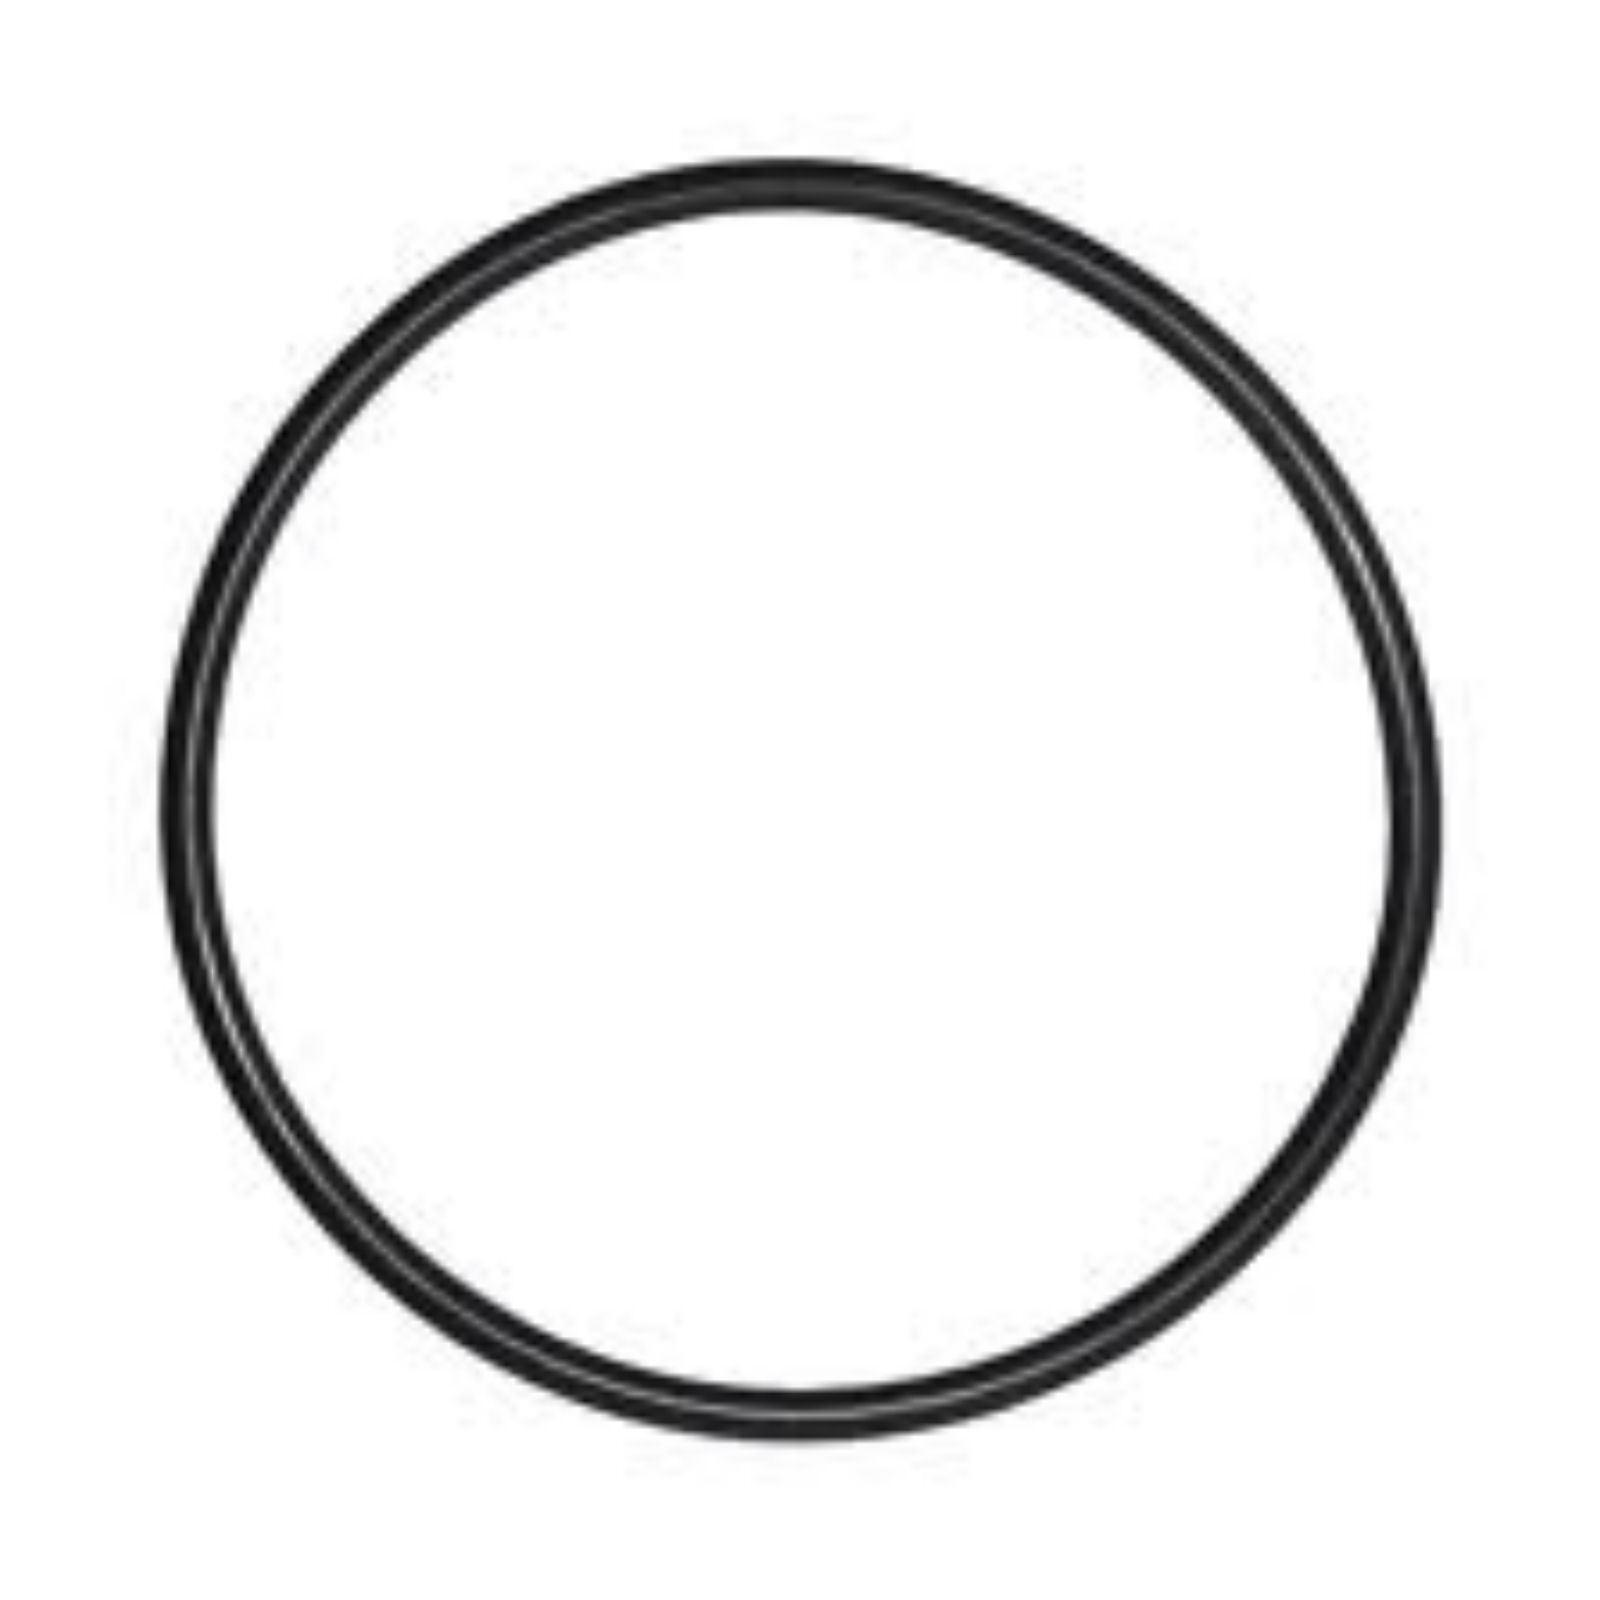 Jebao PU & CW UVC UV Series O Ring Washer Gasket Seal